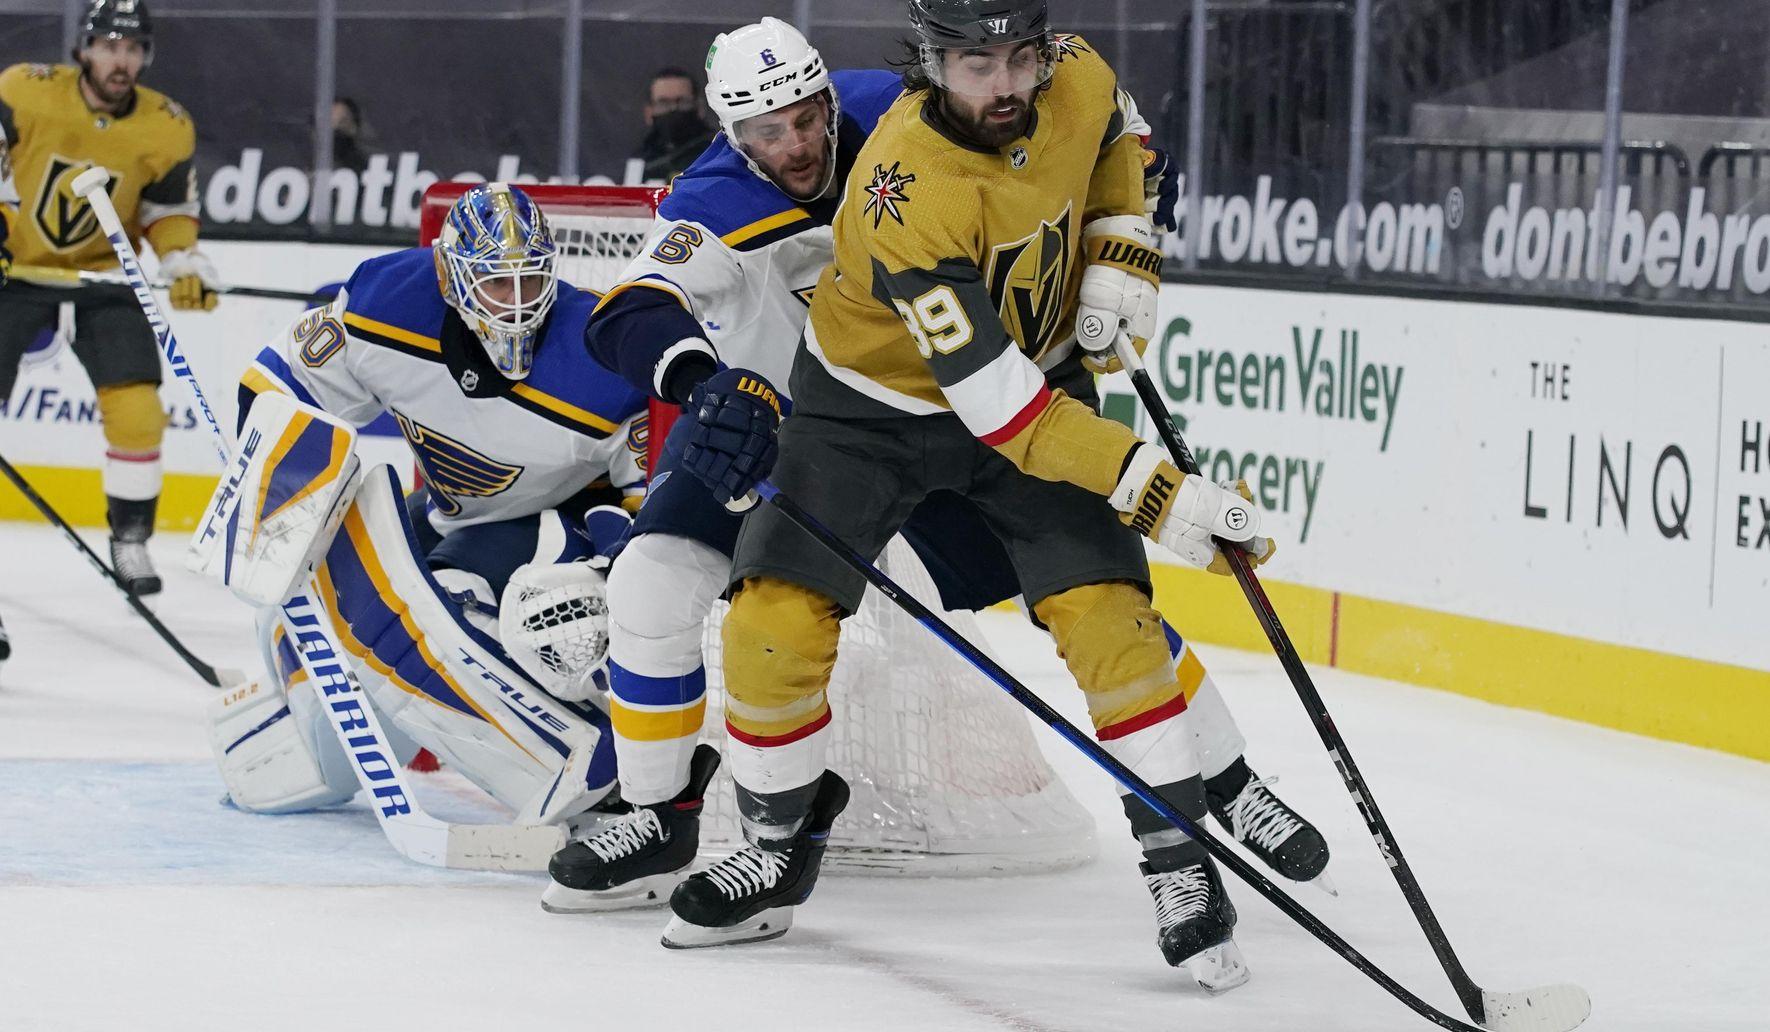 Kolesar scores 1st NHL goal, Golden Knights top Blues 5-1